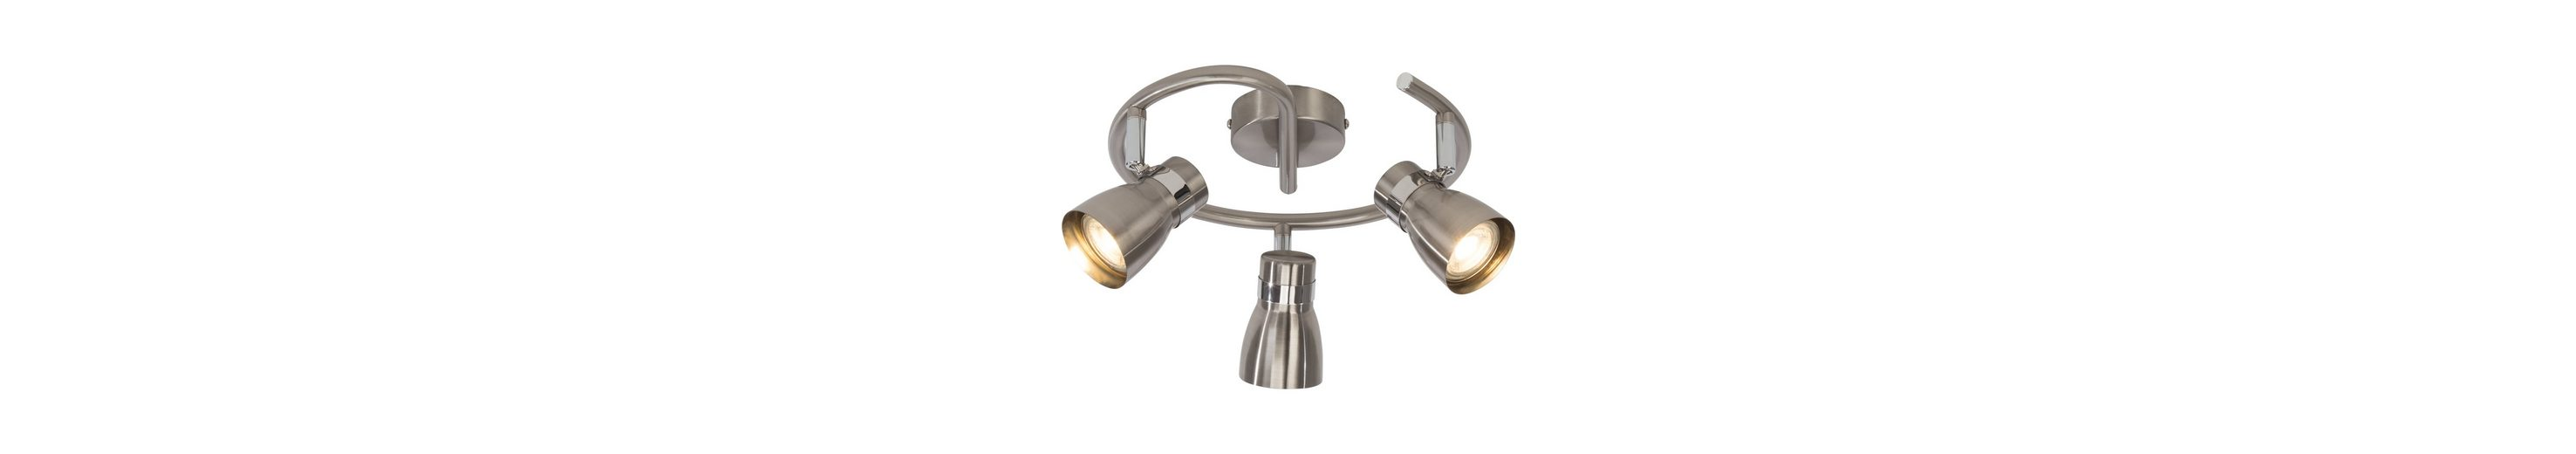 BreLight Mattie LED Spotspirale, 3-flammig eisen/chrom